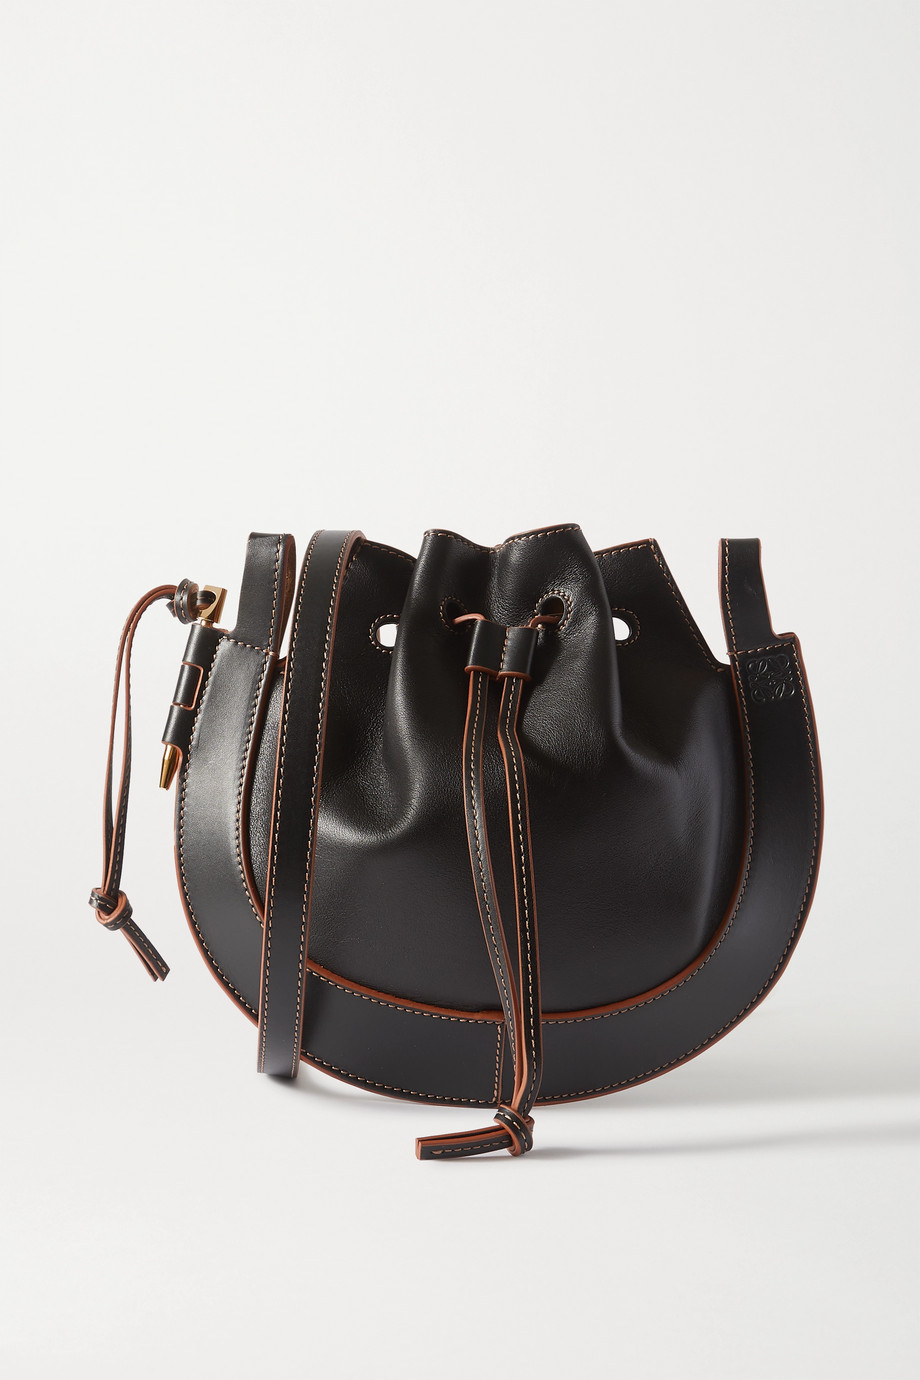 Loewe Horseshoe Schultertasche aus Leder